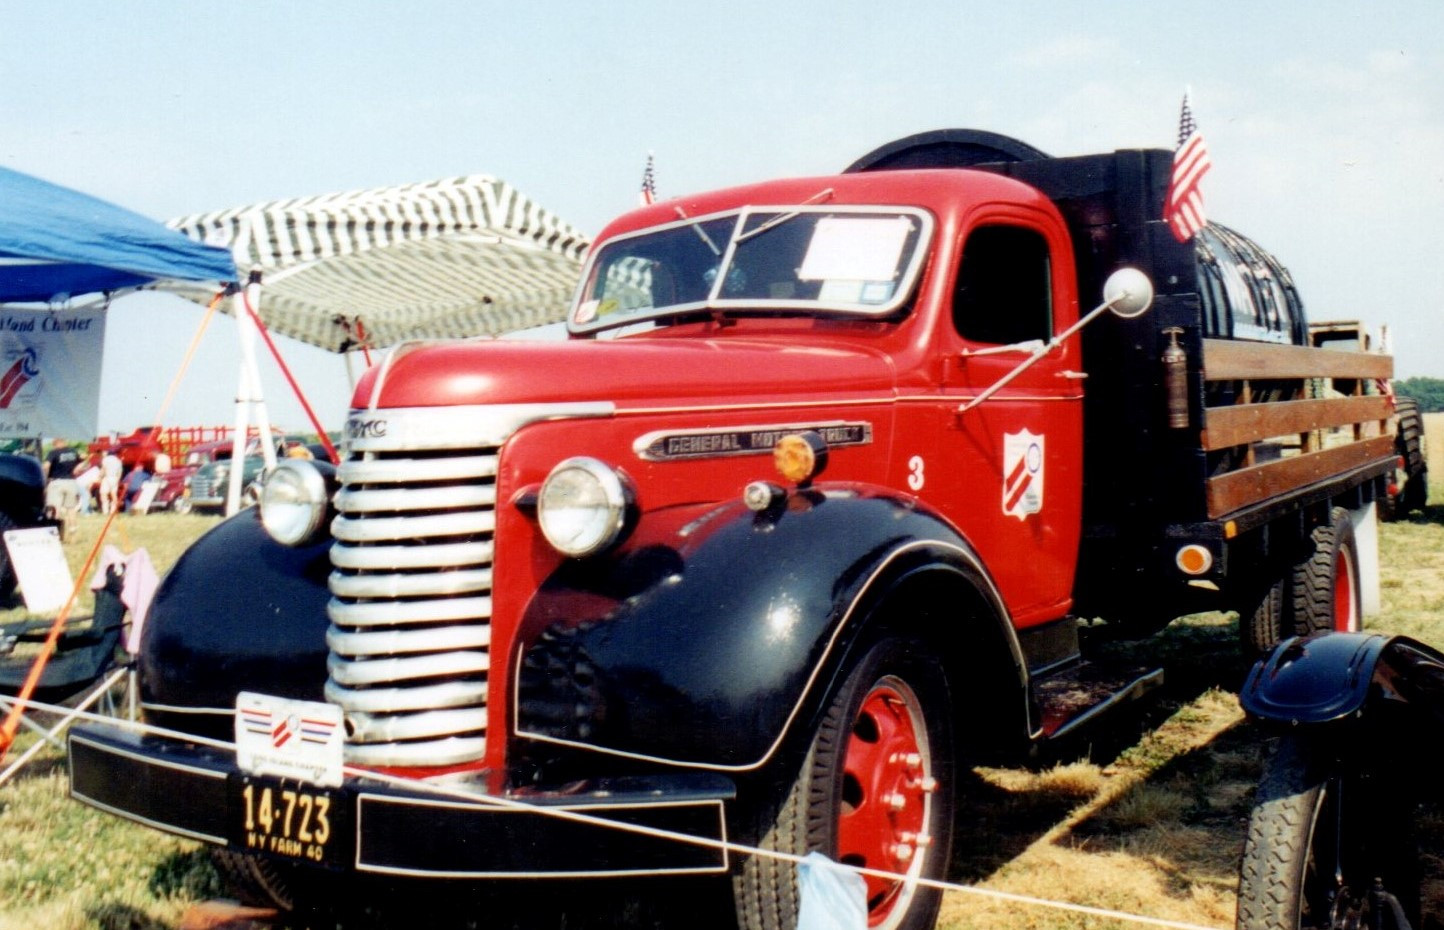 1940 GMC AC354 water wagon - Denis Ryan